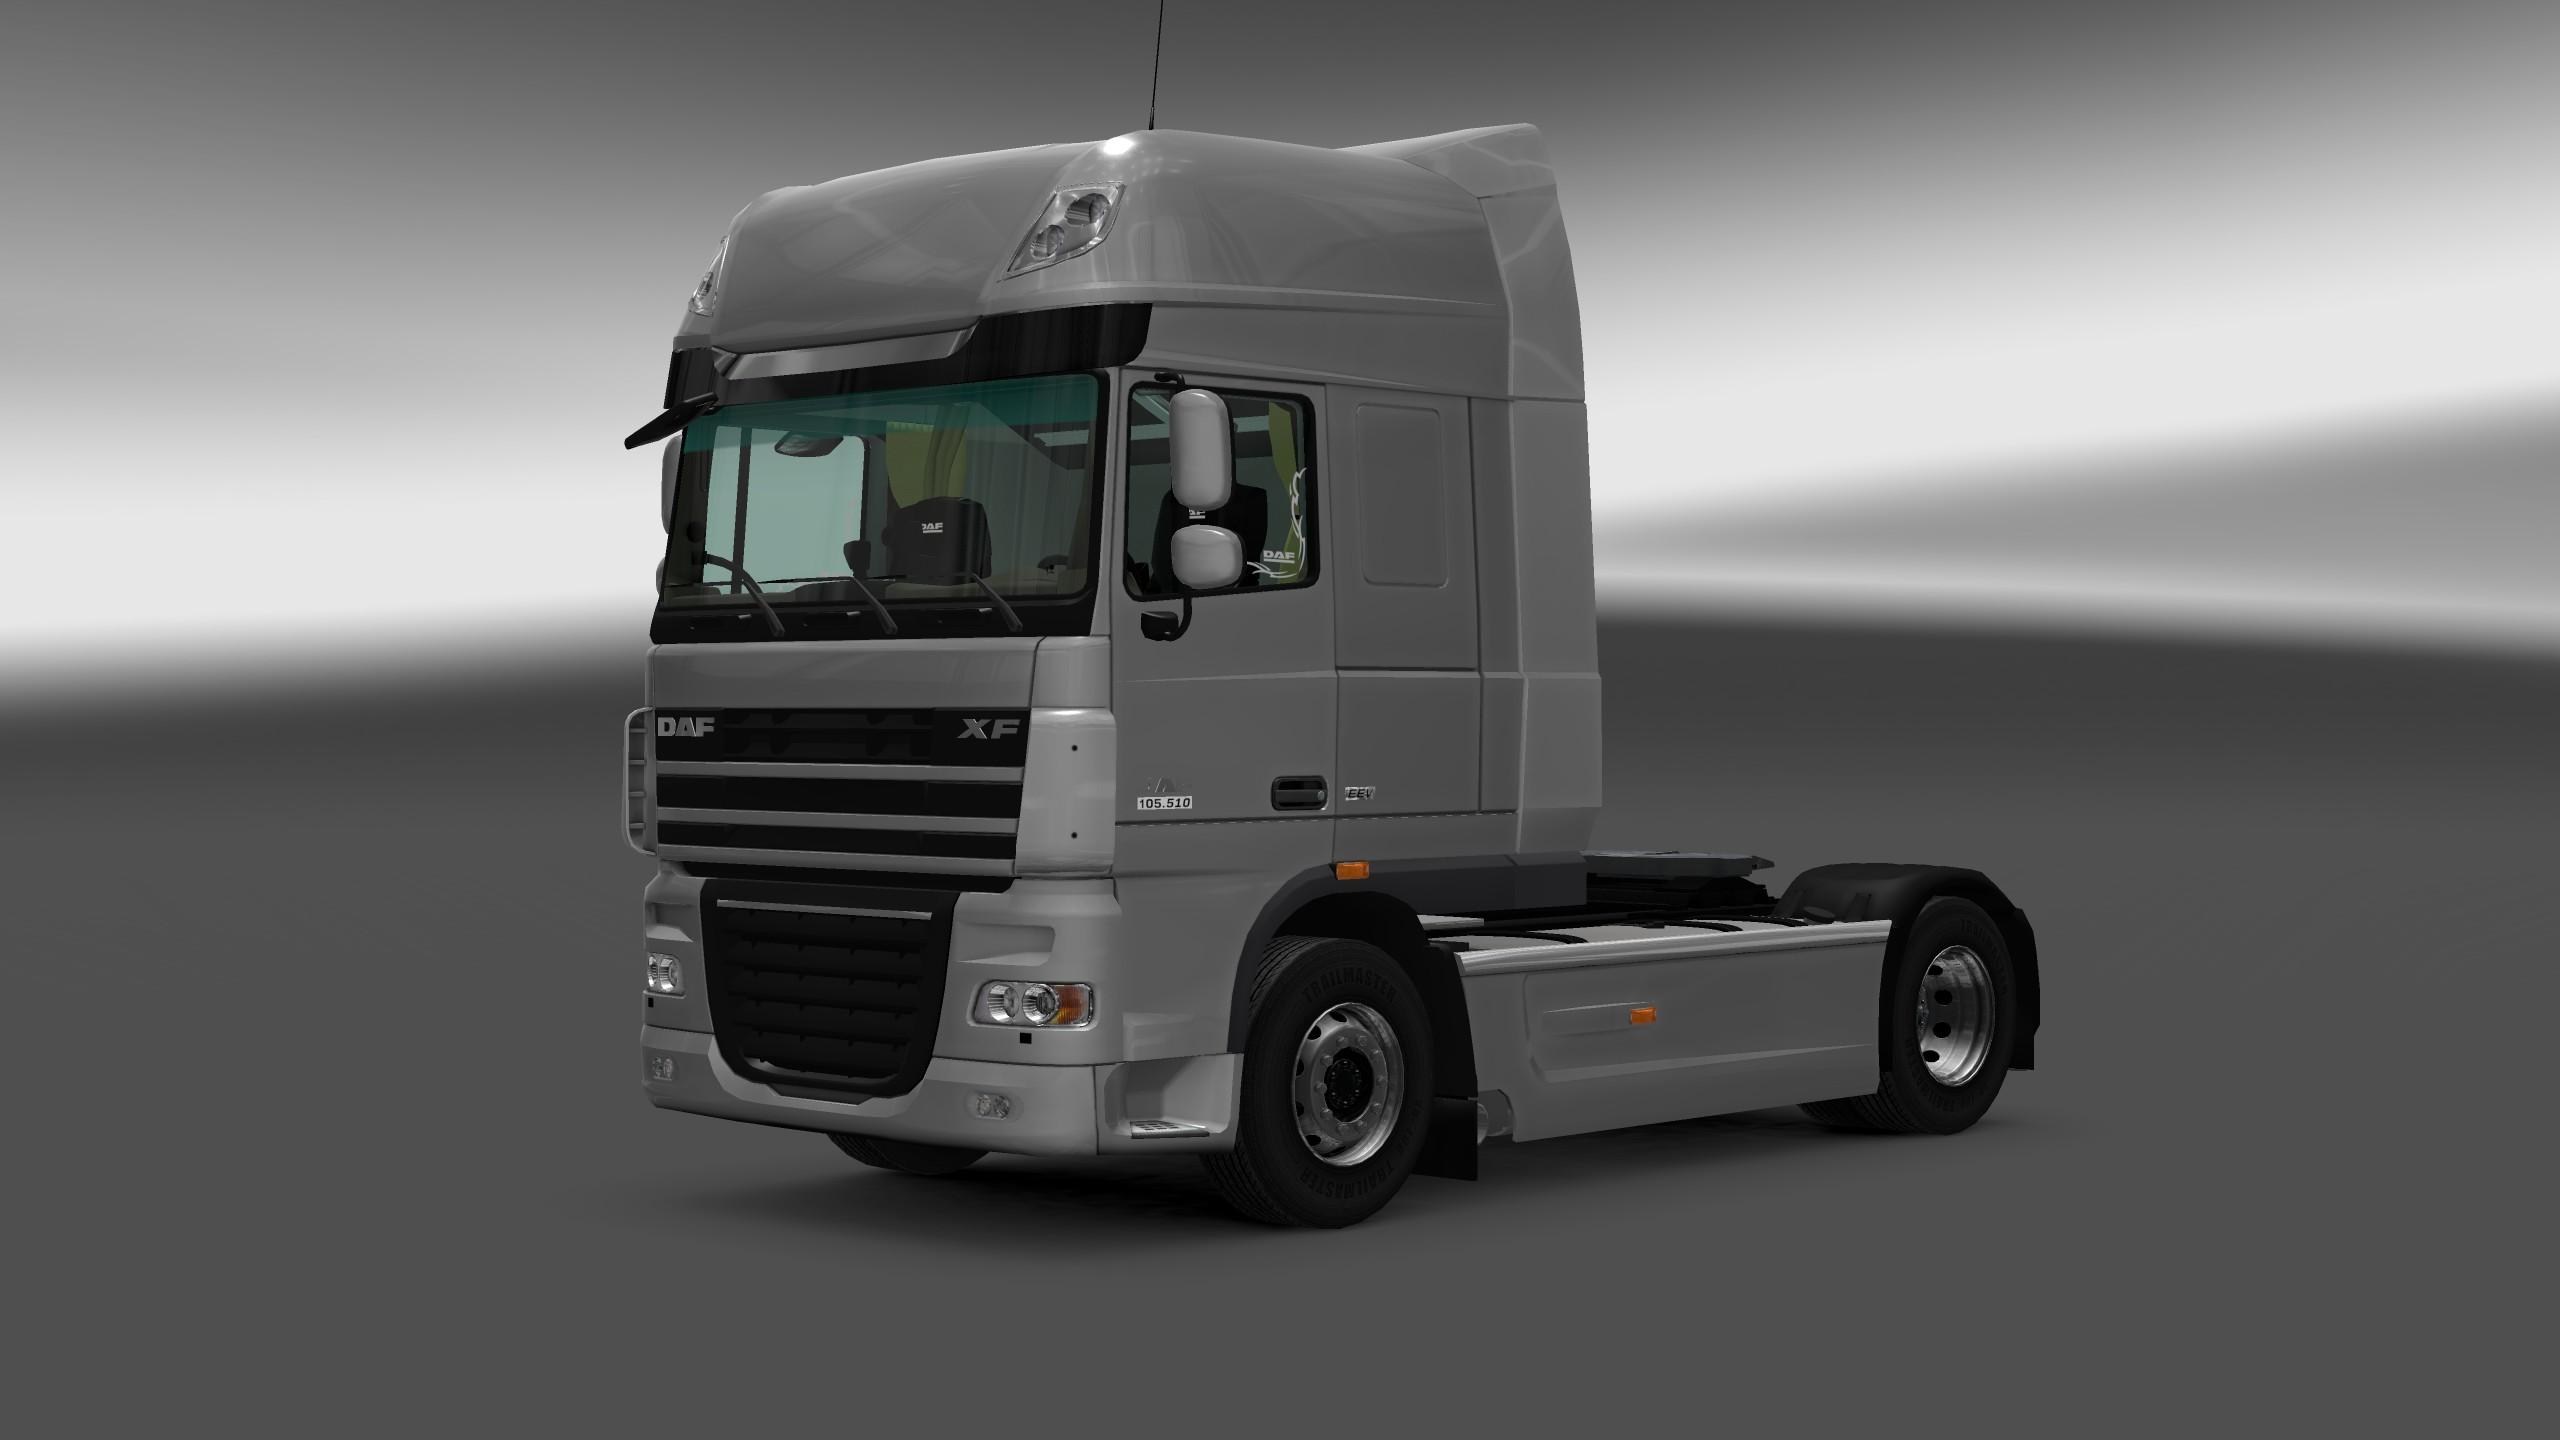 IMPROVED DAF XF 105 V1.0 Truck -Euro Truck Simulator 2 Mods